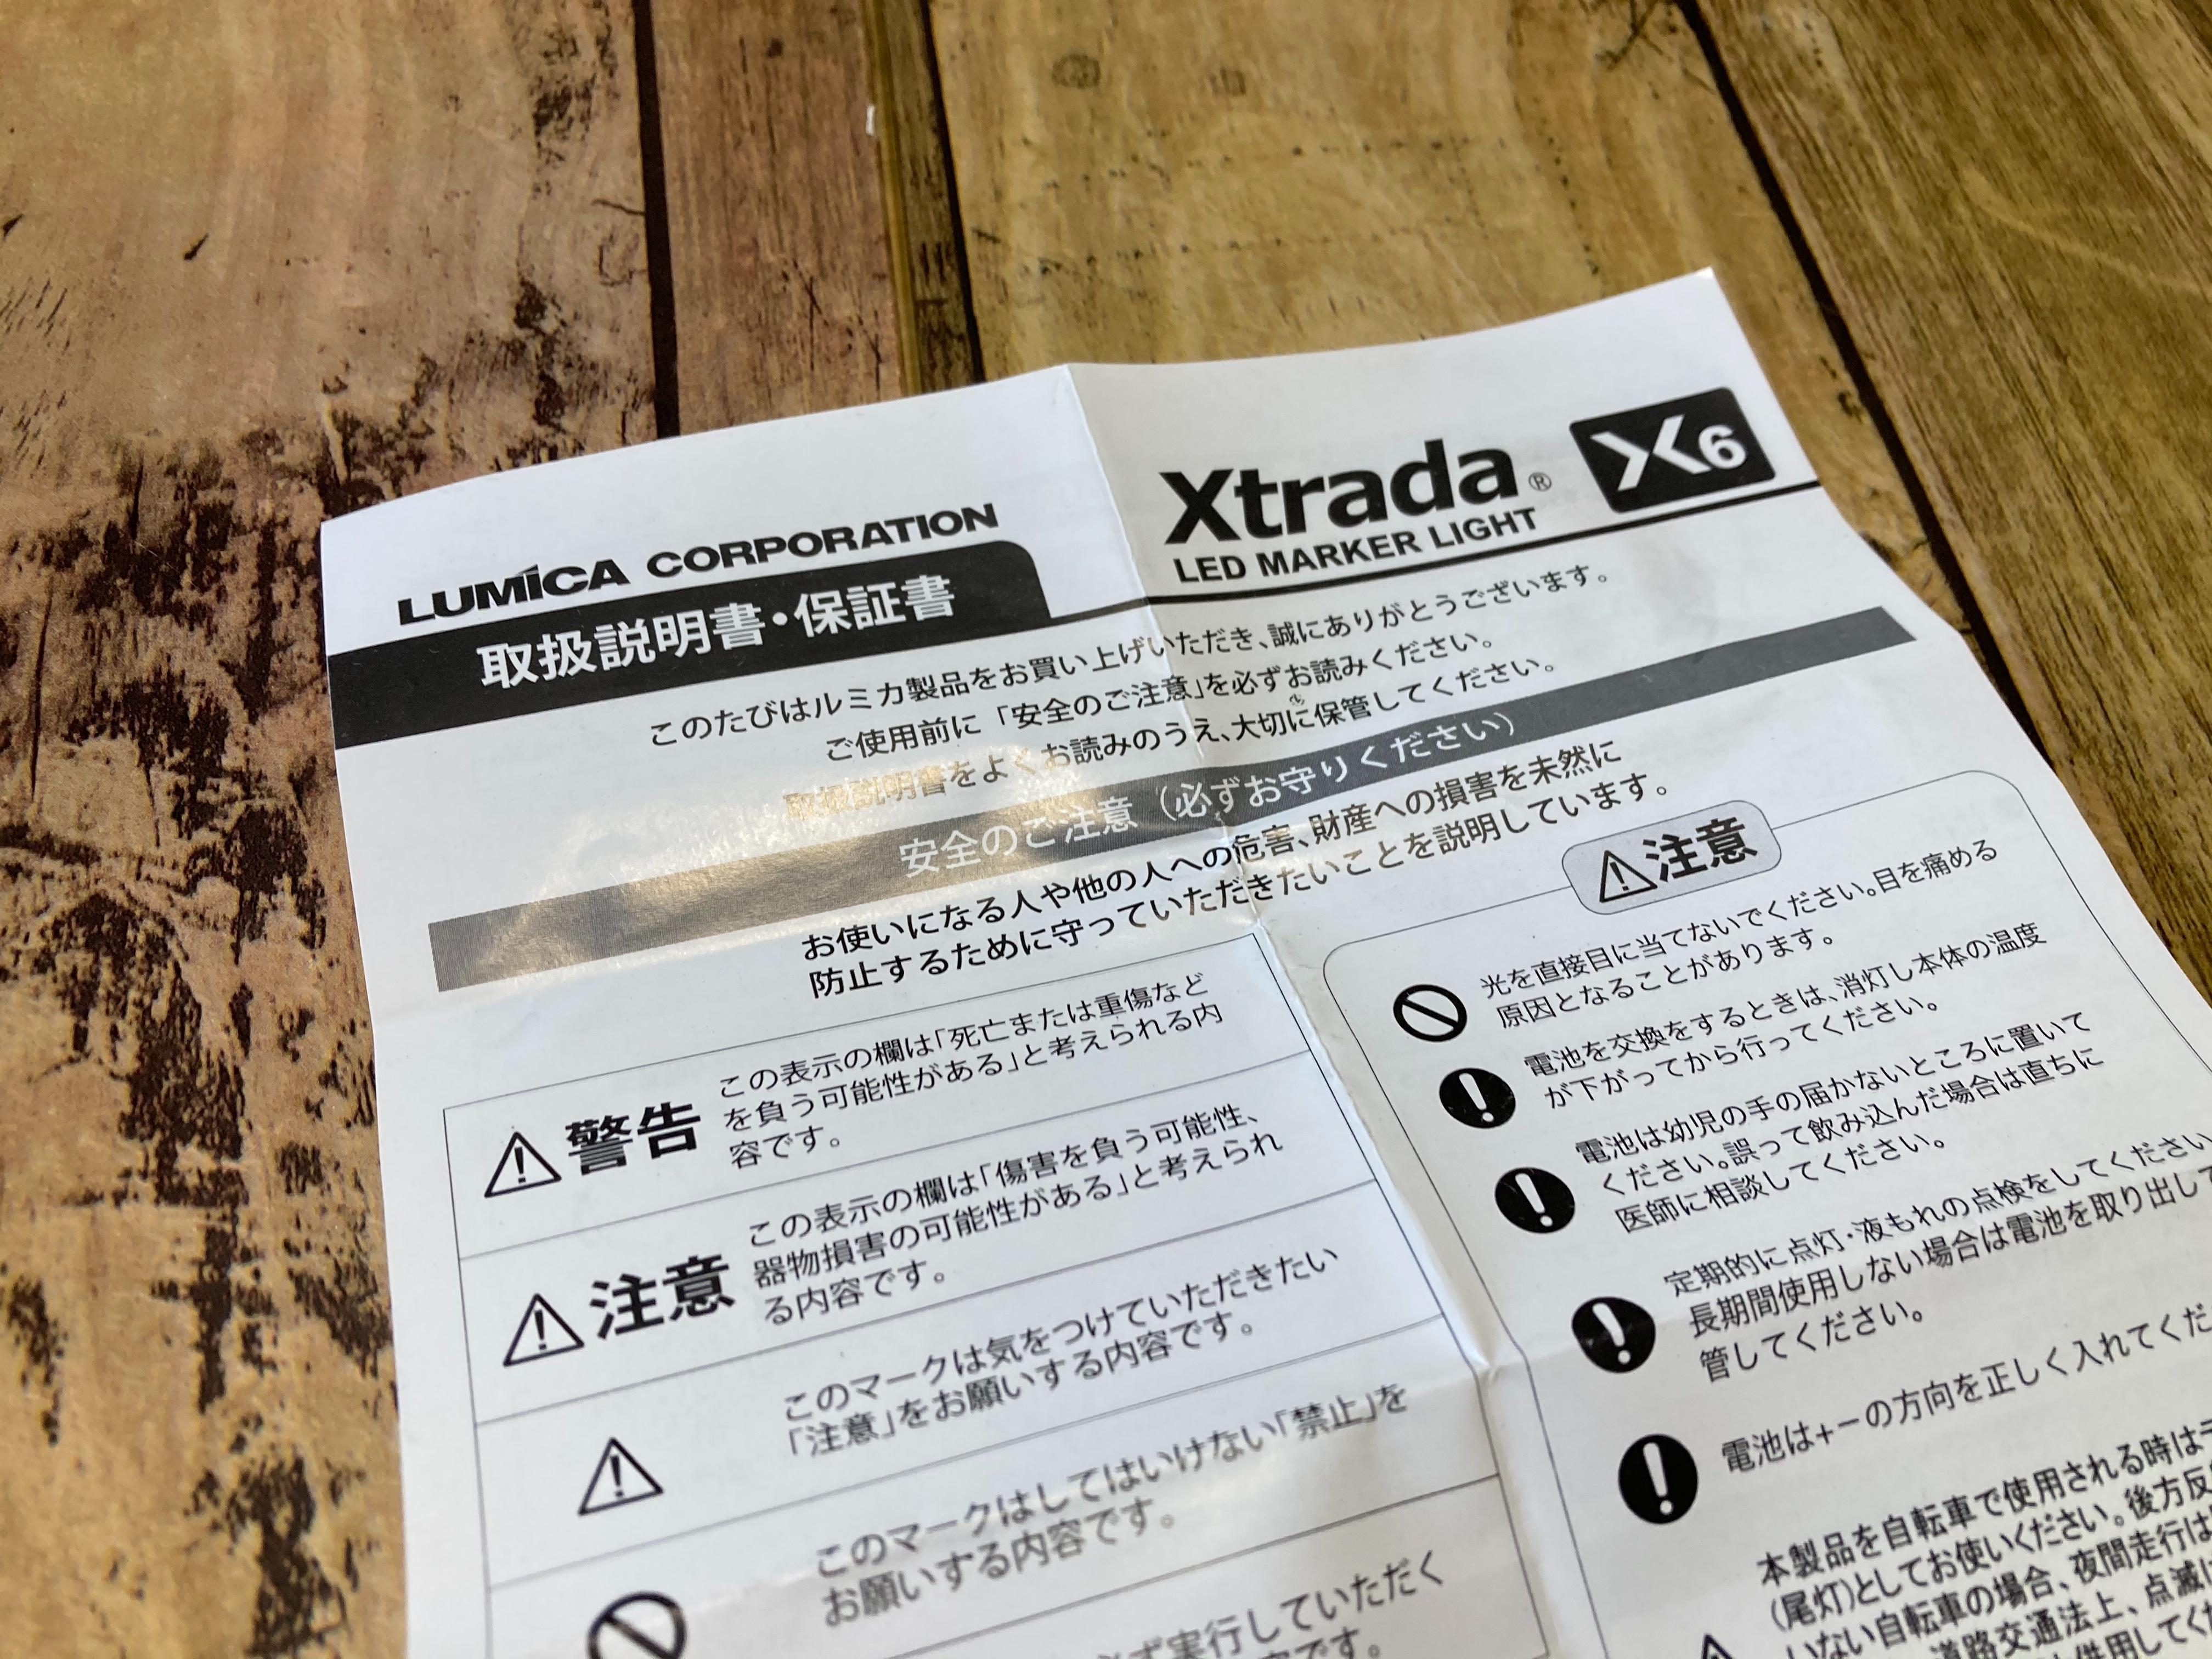 f:id:kuribox:20210522112058j:image